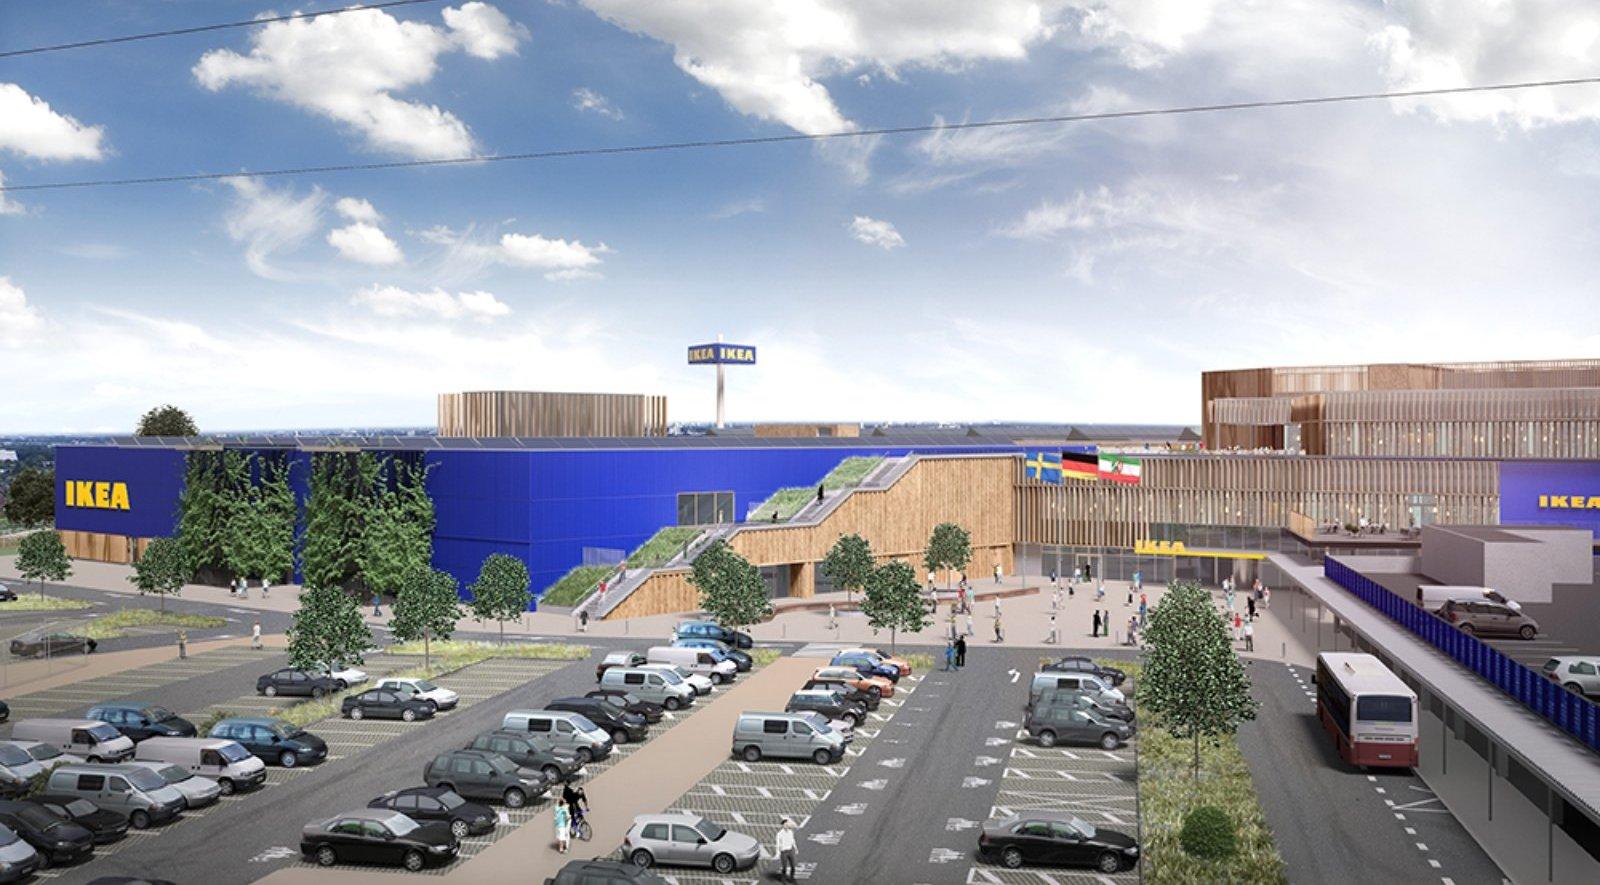 new-built IKEA store in Kaars